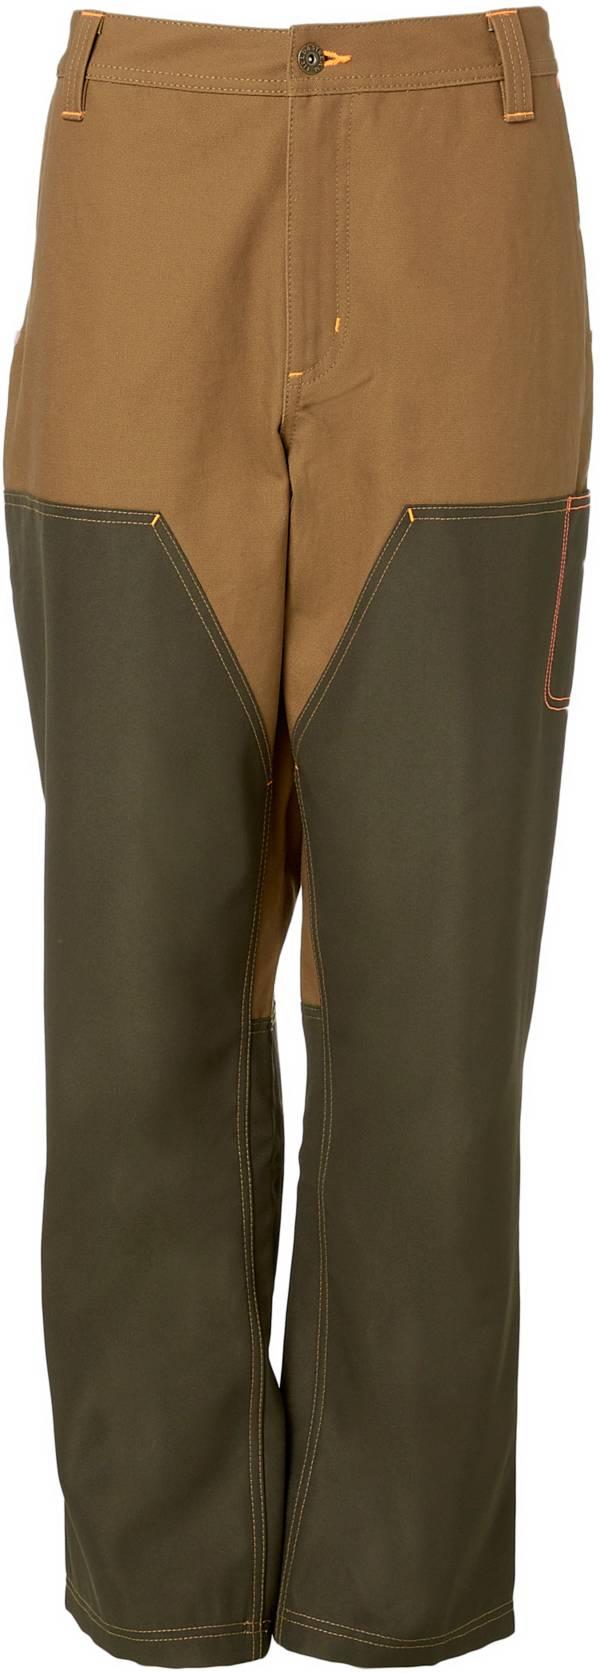 Field & Stream Men's Every Hunt Field Pants product image